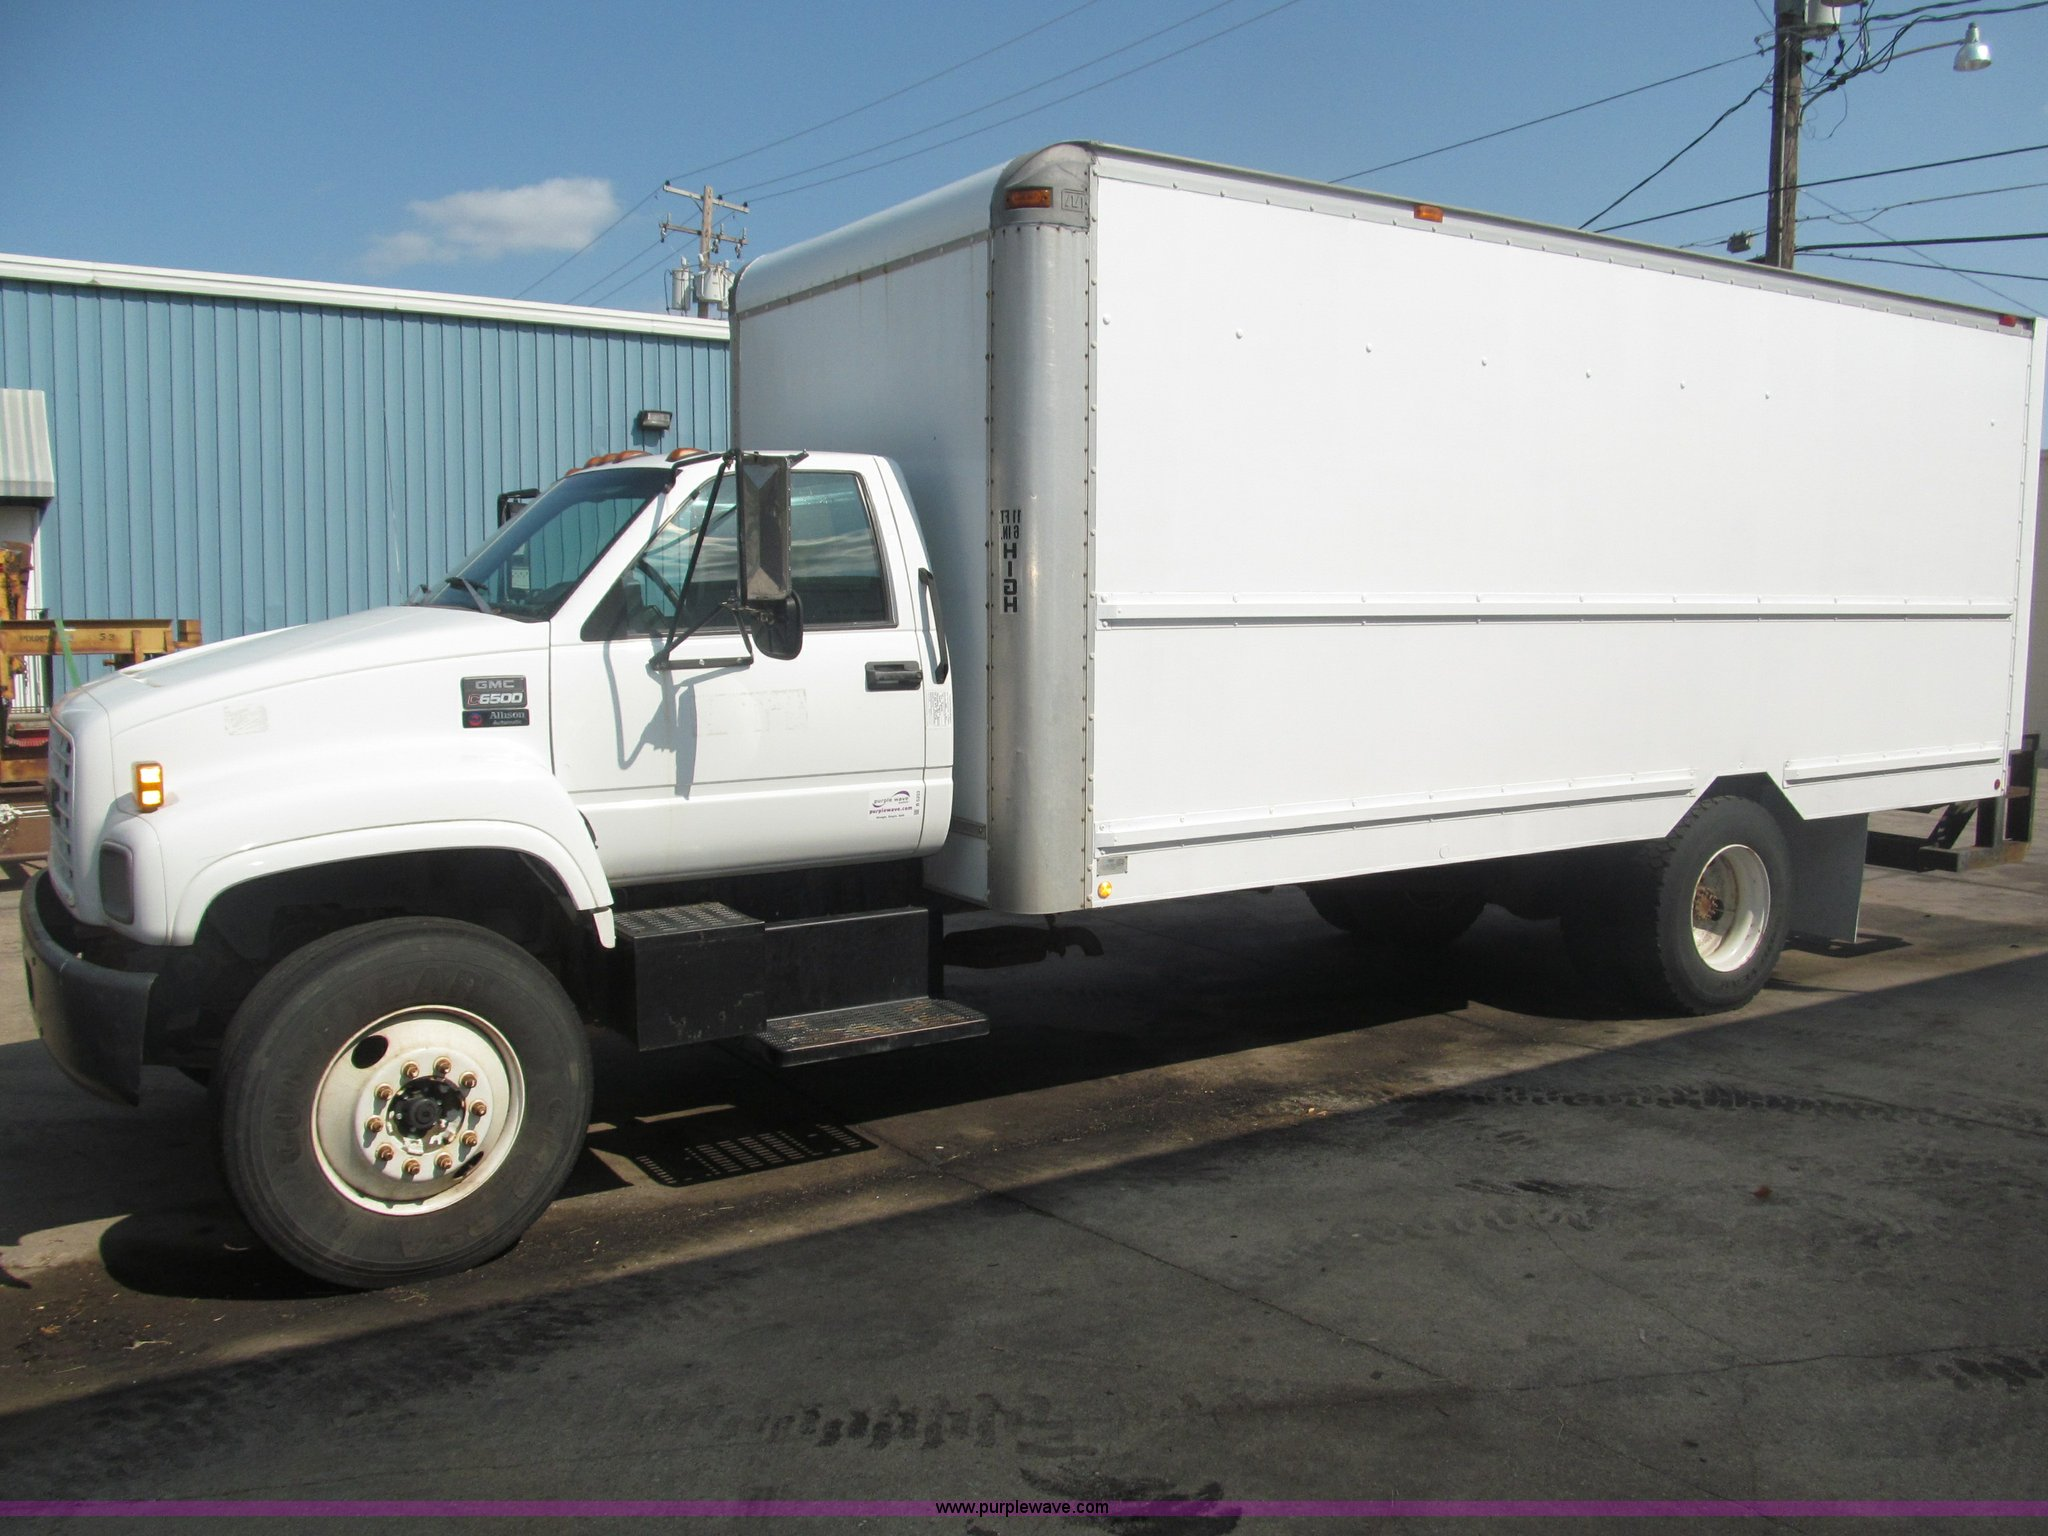 1998 gmc c6500 box truck item b5203 sold! wednesday augu GMC Dump Truck b5203 image for item b5203 1998 gmc c6500 box truck